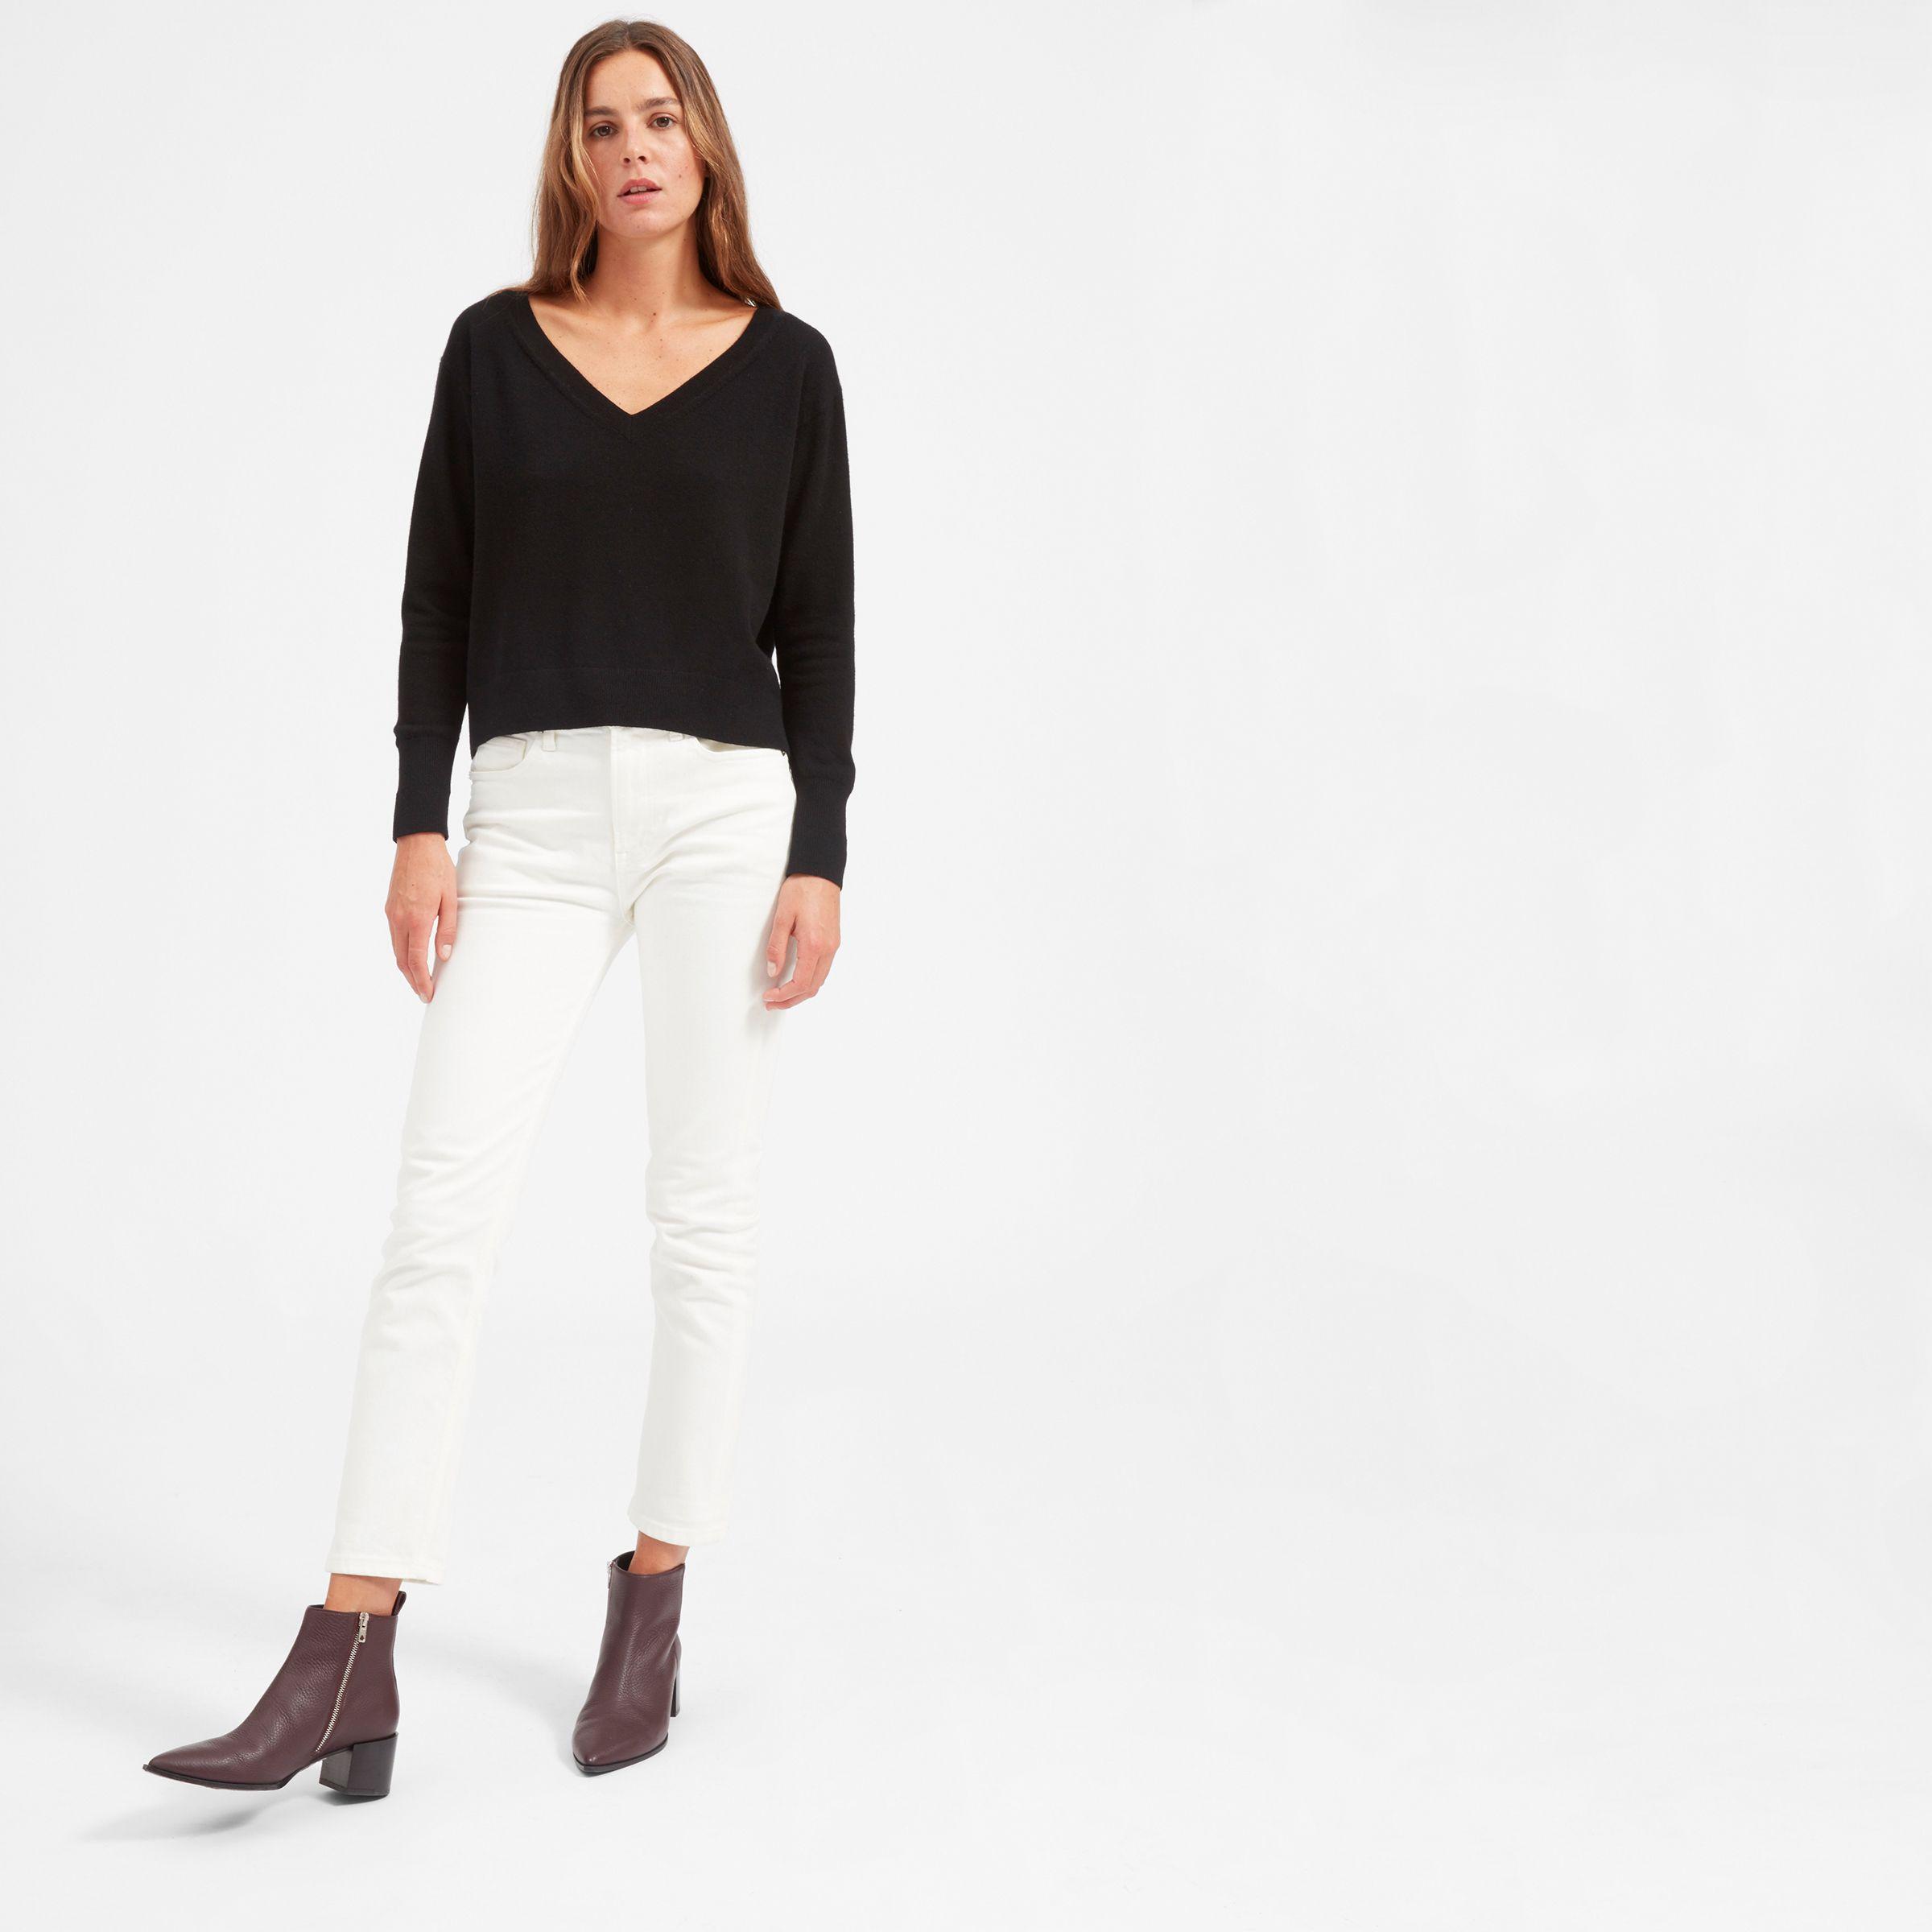 508b7cc551 Everlane cropped cashmere sweater